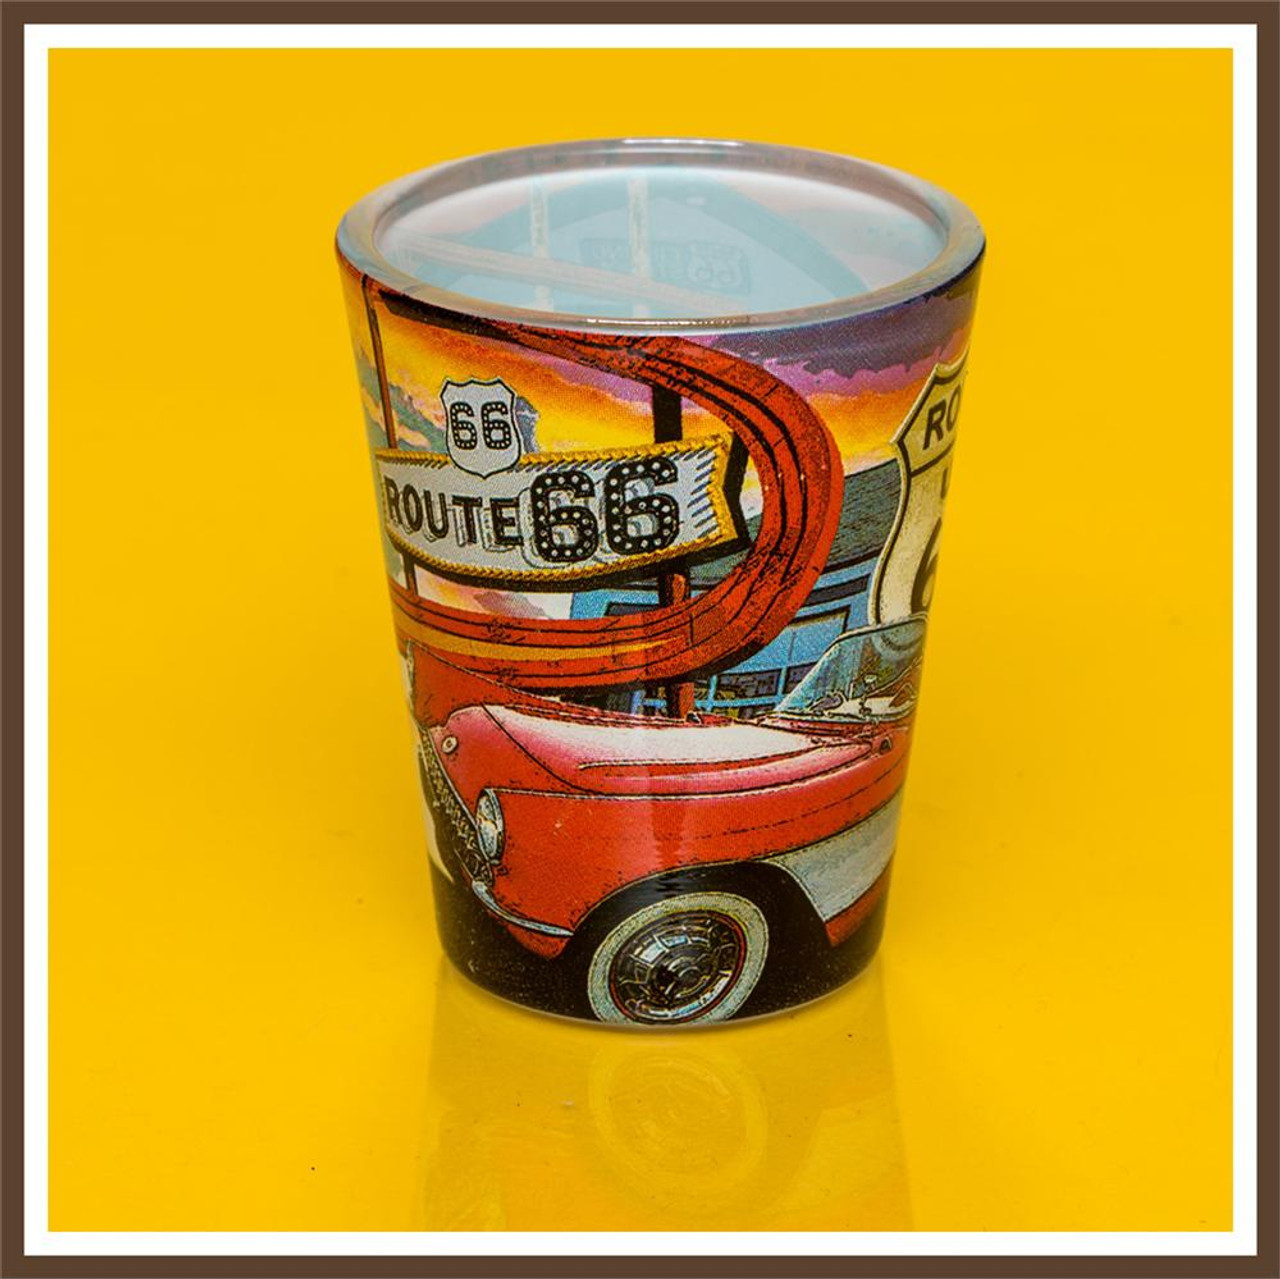 Route 66 Car Collage Shotglass